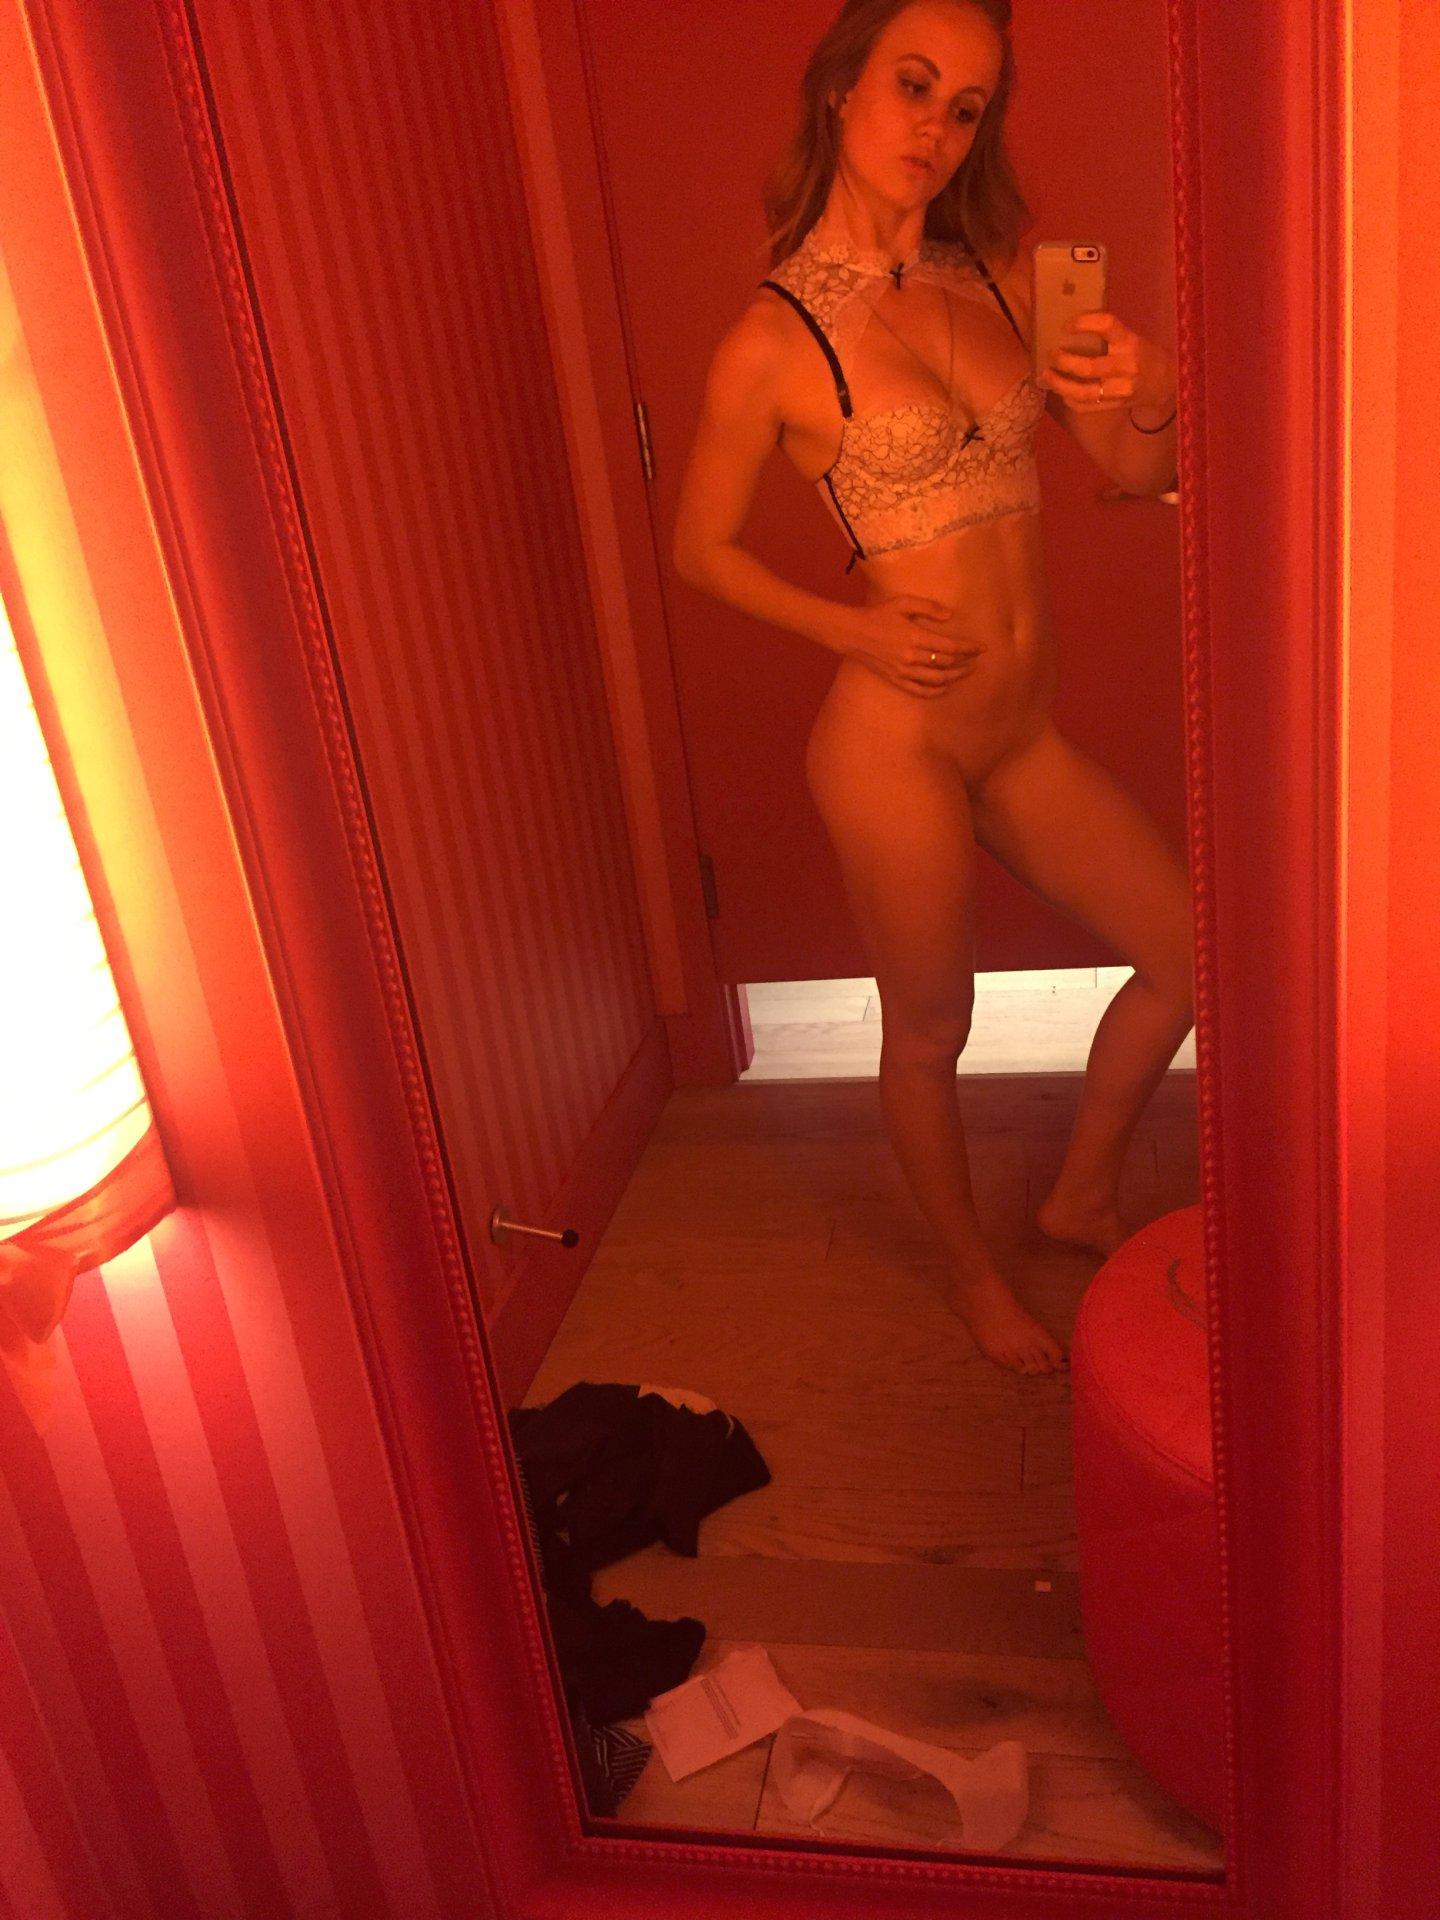 Amanda seyfried nude sex scene in chloe scandalplanetcom 2